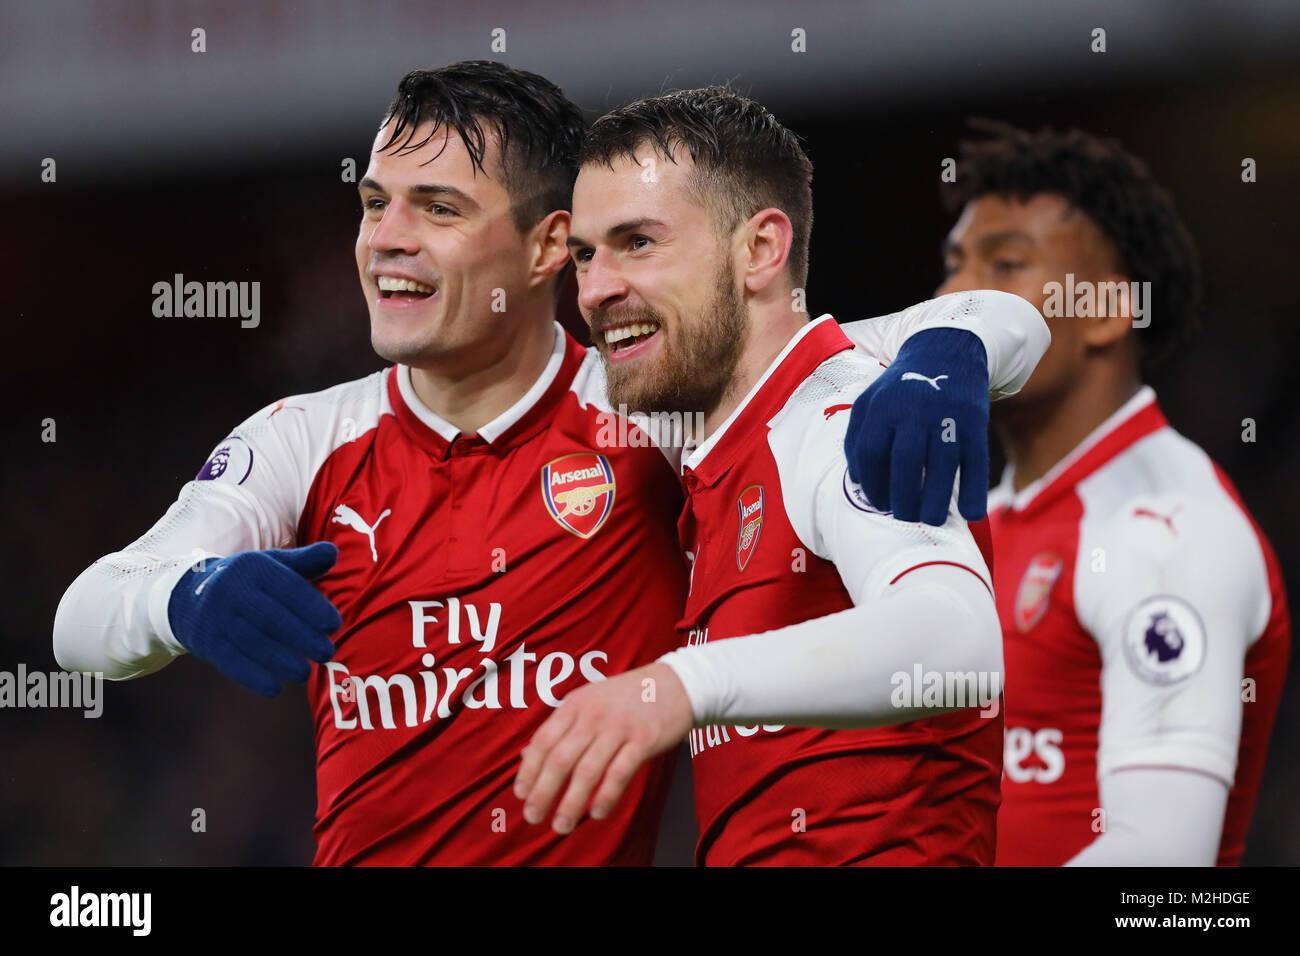 Aaron Ramsey (right) and Granit Xhaka (left) of Arsenal - Arsenal v Everton, Premier League, Emirates Stadium, London, - Stock Image